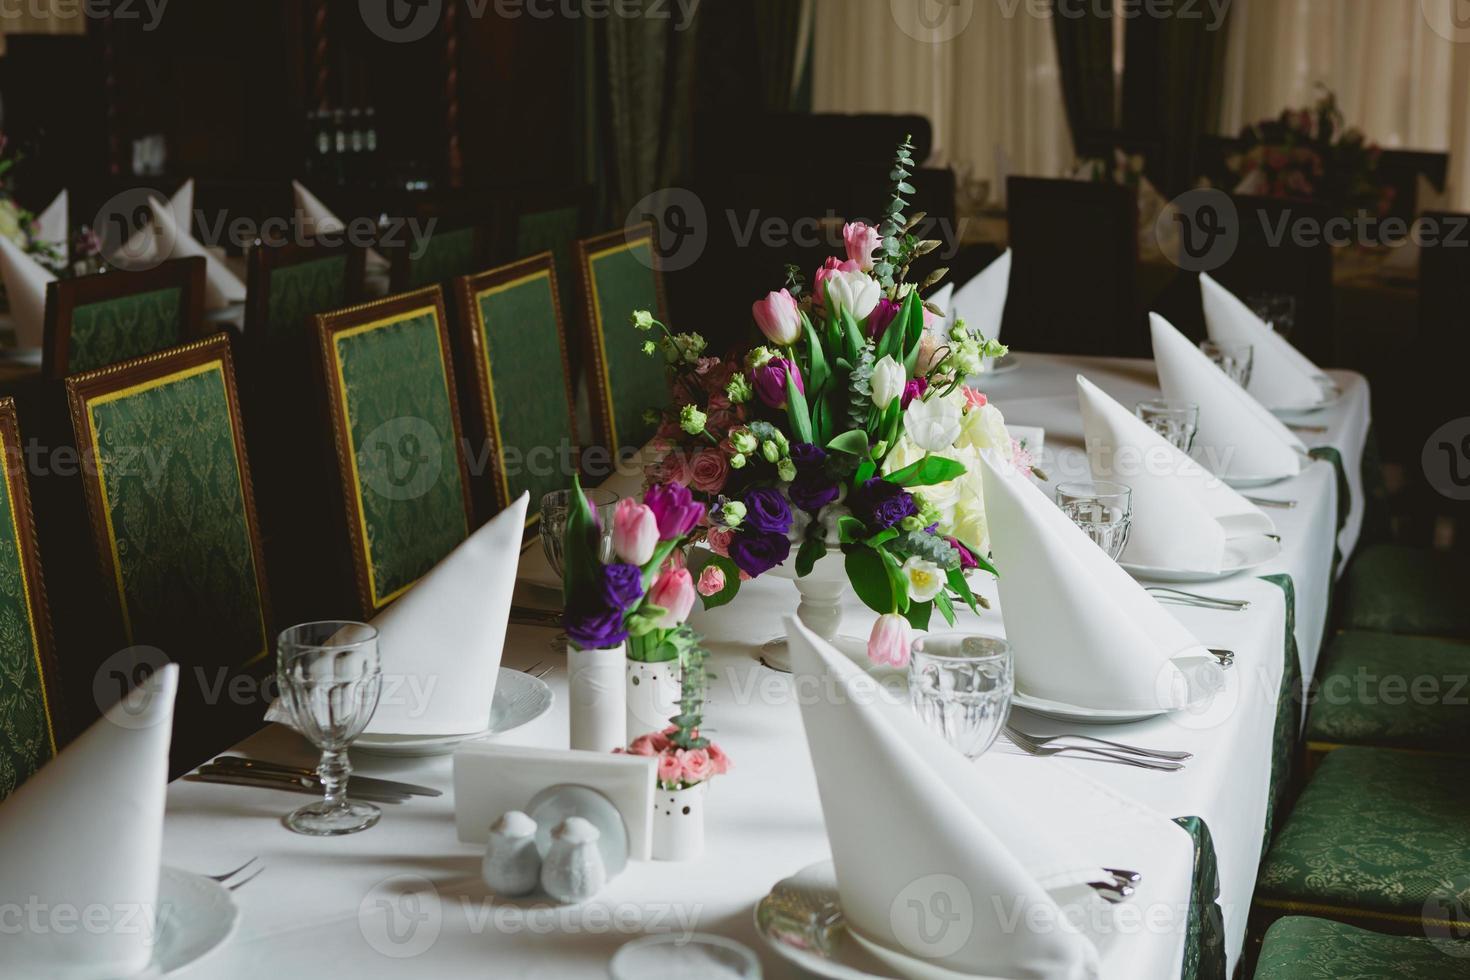 lindas flores na mesa foto